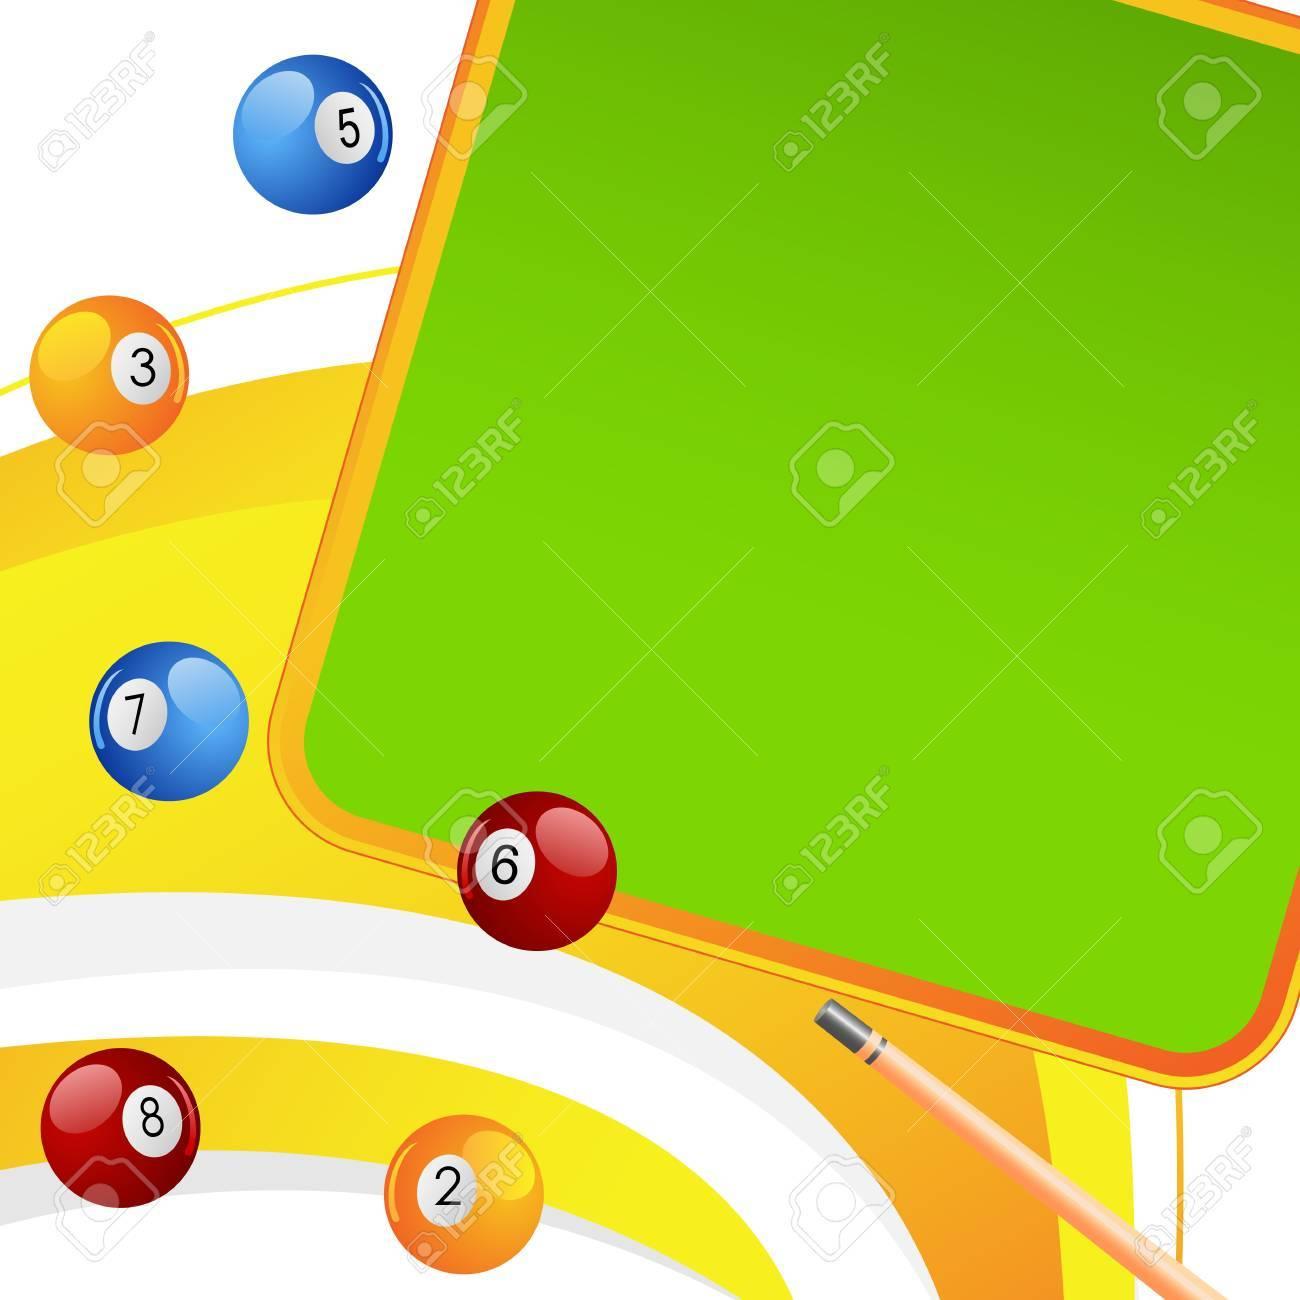 Colorful Snooker Ball Stock Vector - 18414105